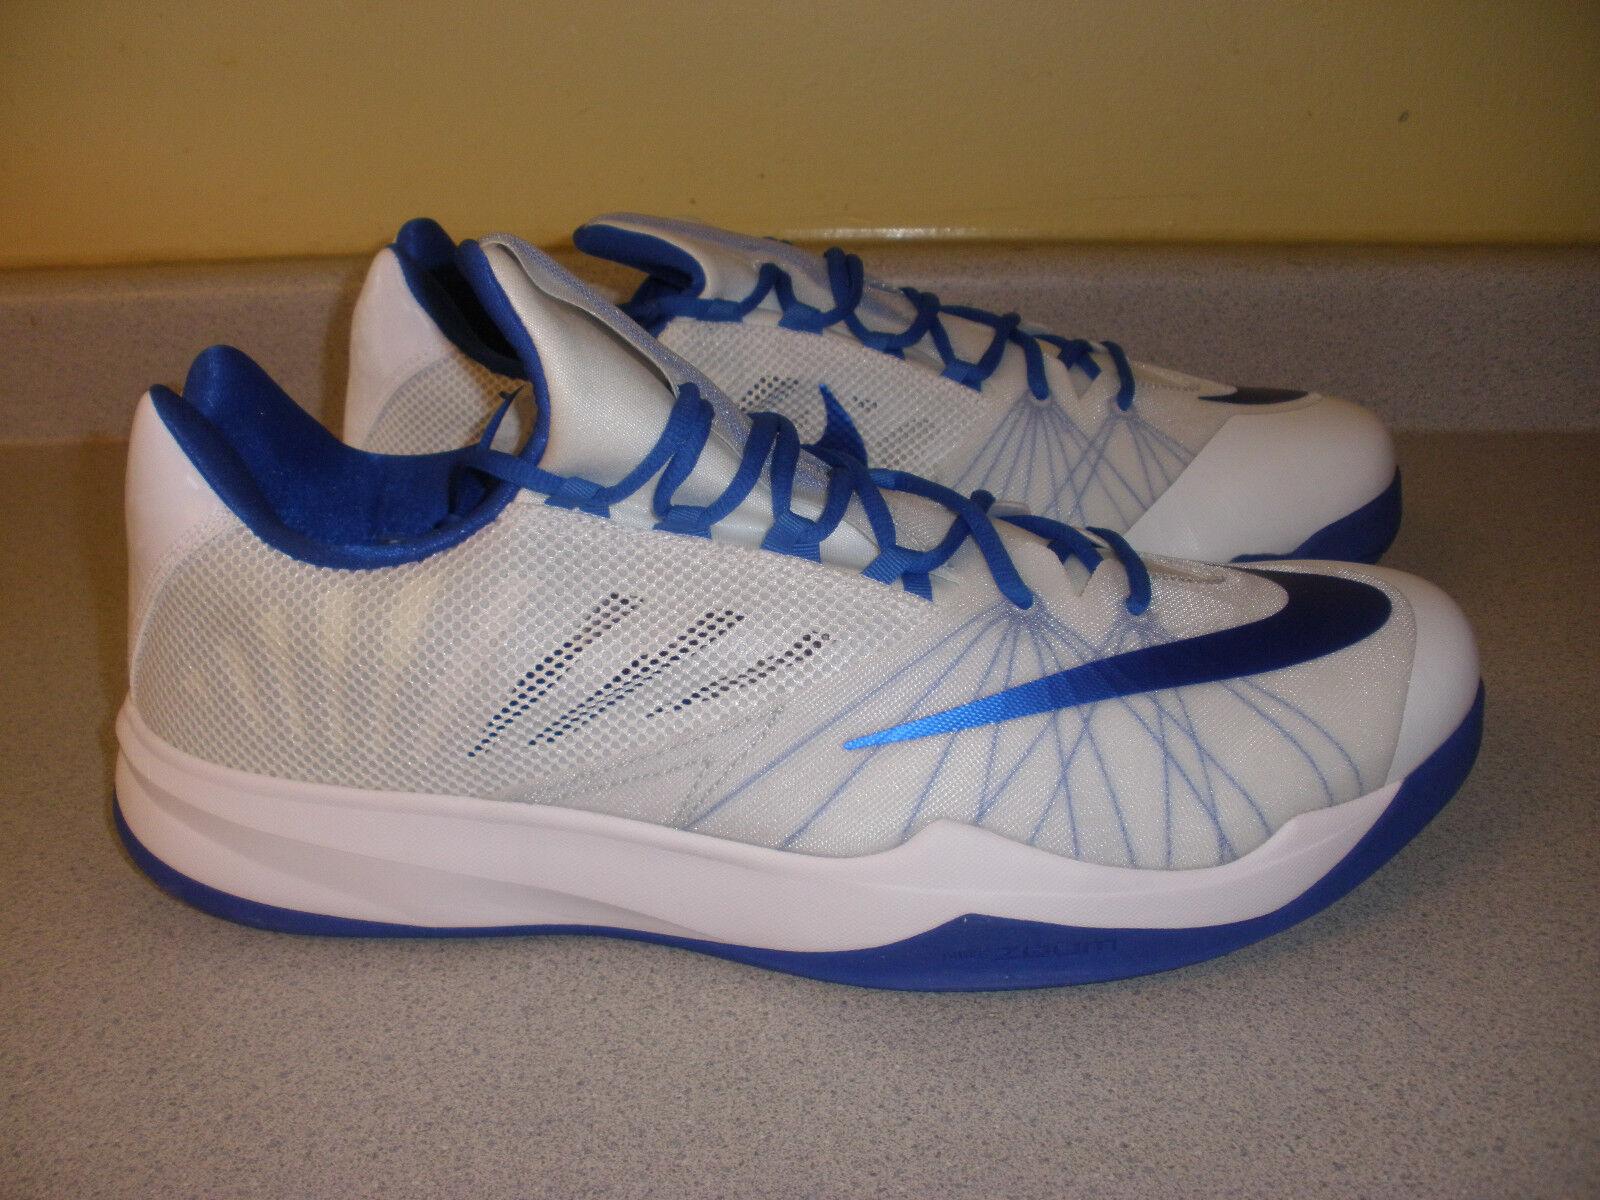 685779-140 NIKE Blue Zoom Run The One TB Basketball Shoes Blue NIKE White Size 18 407d3b